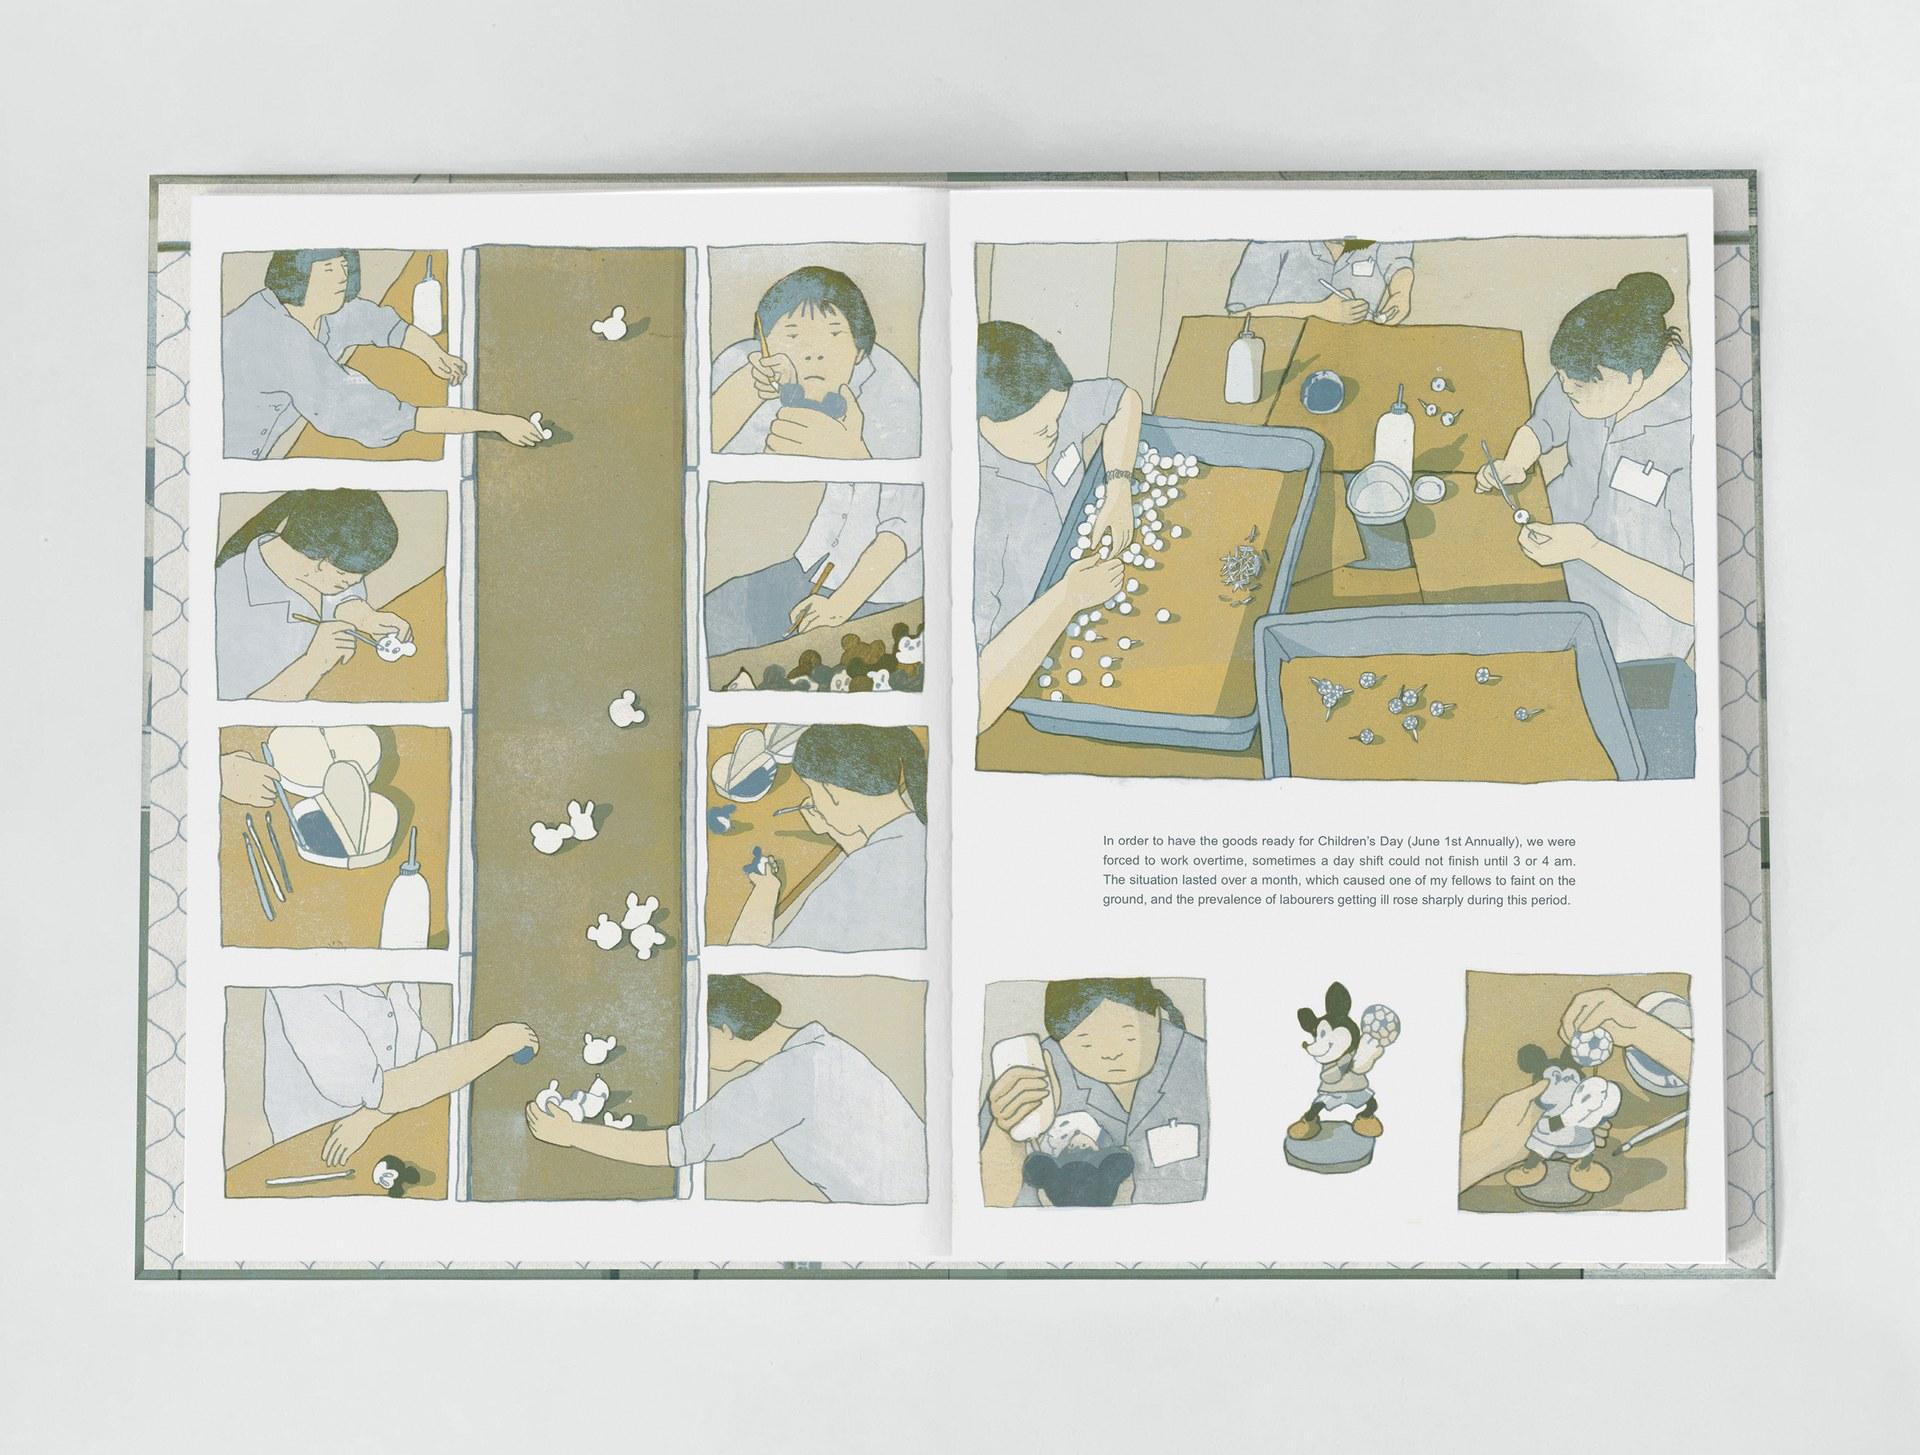 pp.38-39